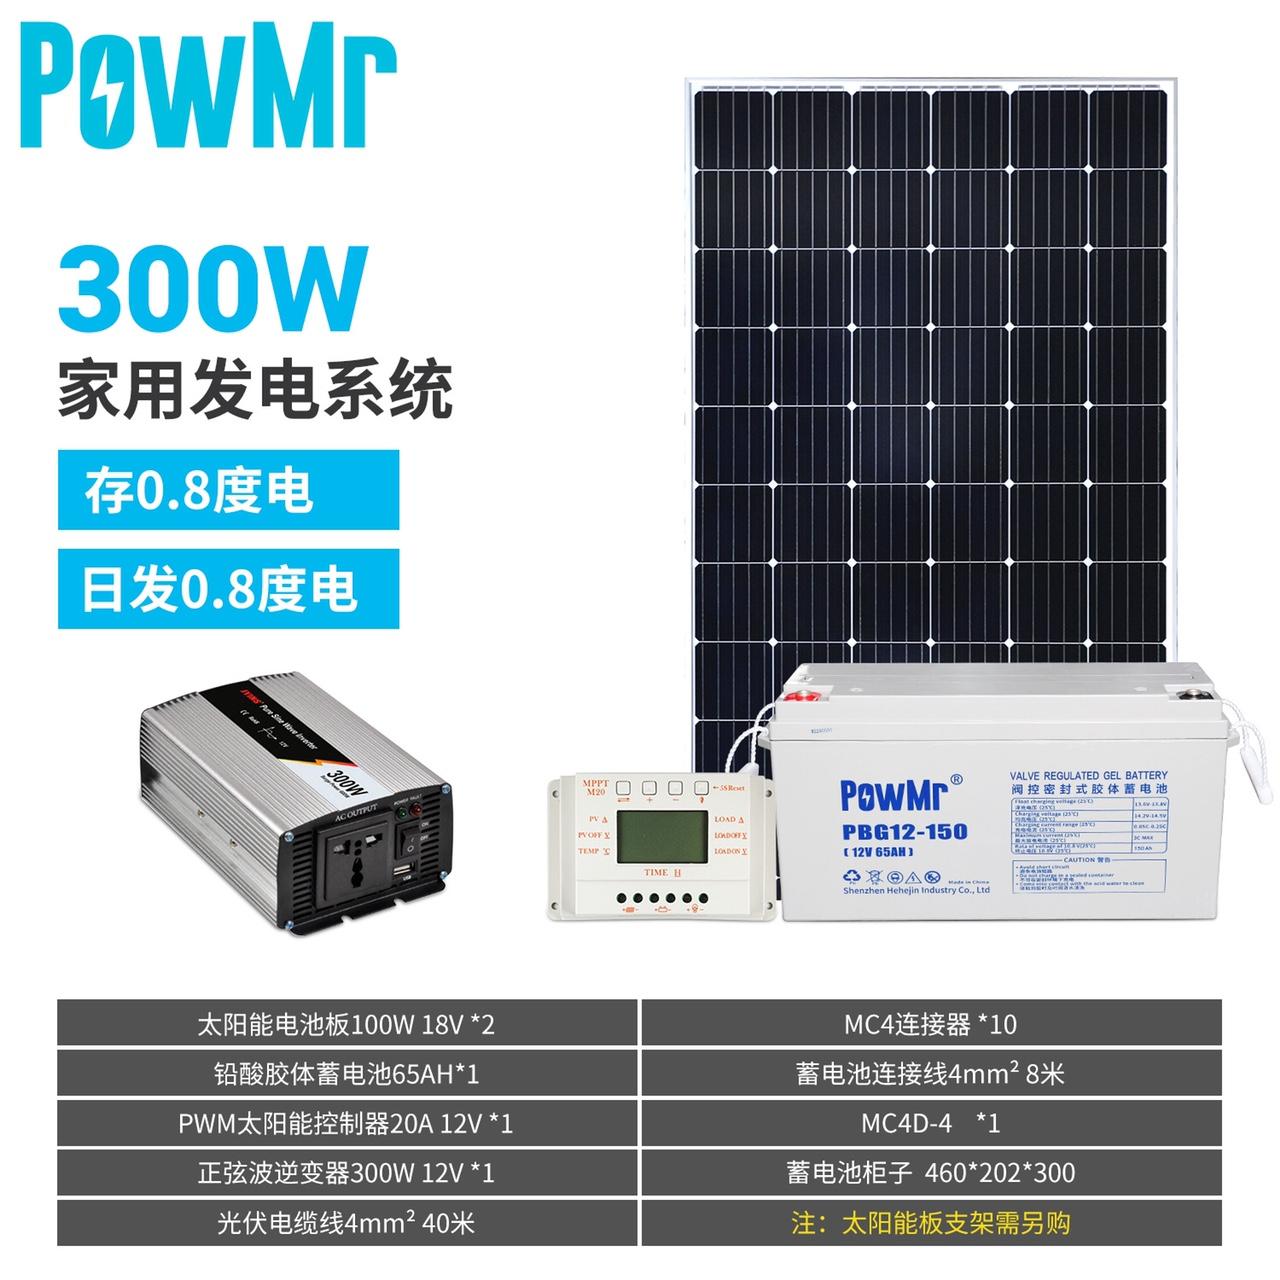 PowMr家用小型太阳能发电系统JYP300W220V户外发电板光伏发电系统